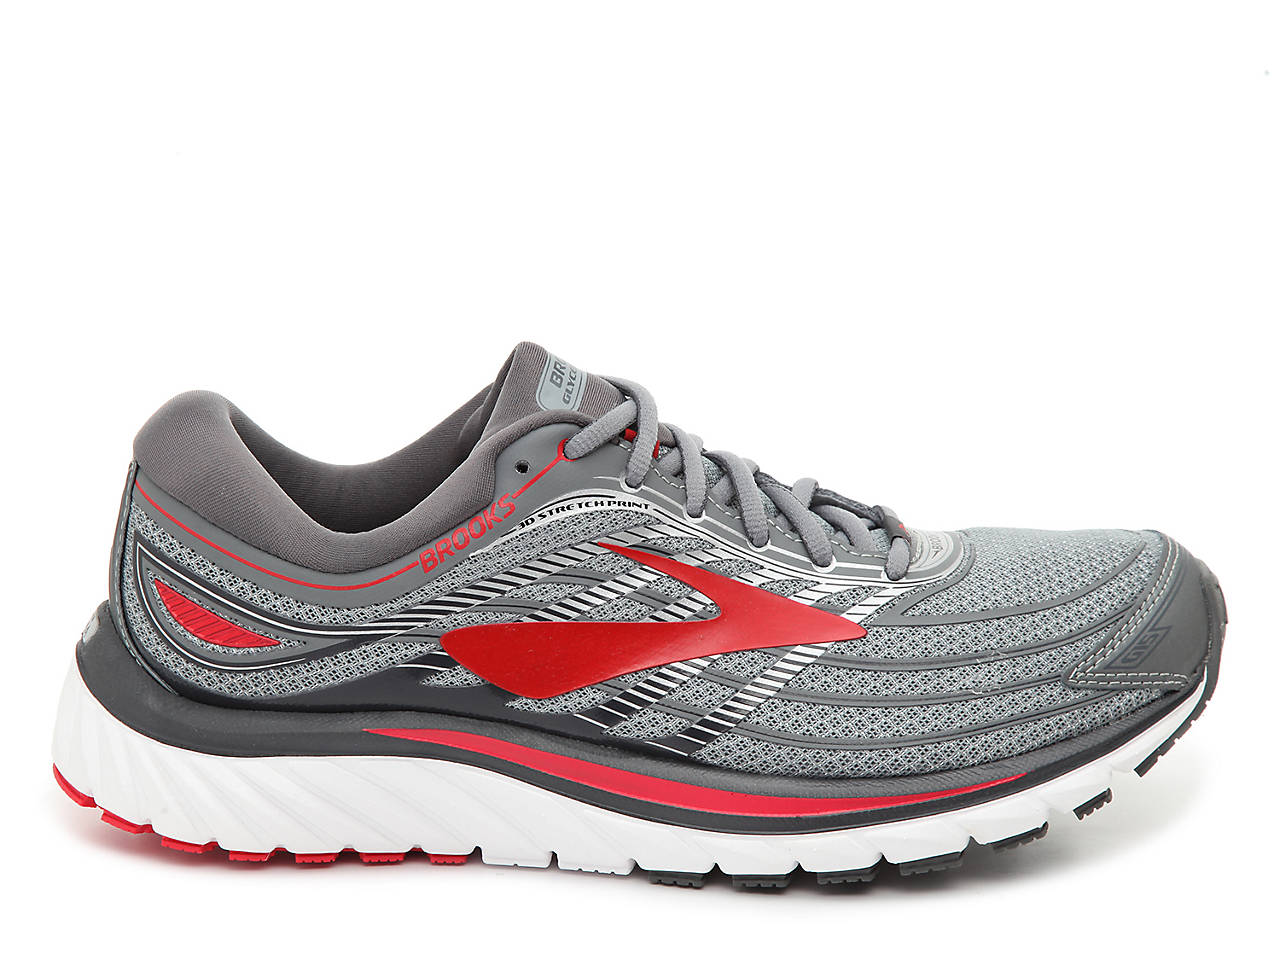 7bdb2d111e90f Brooks Glycerin 15 Running Shoe - Men s Men s Shoes